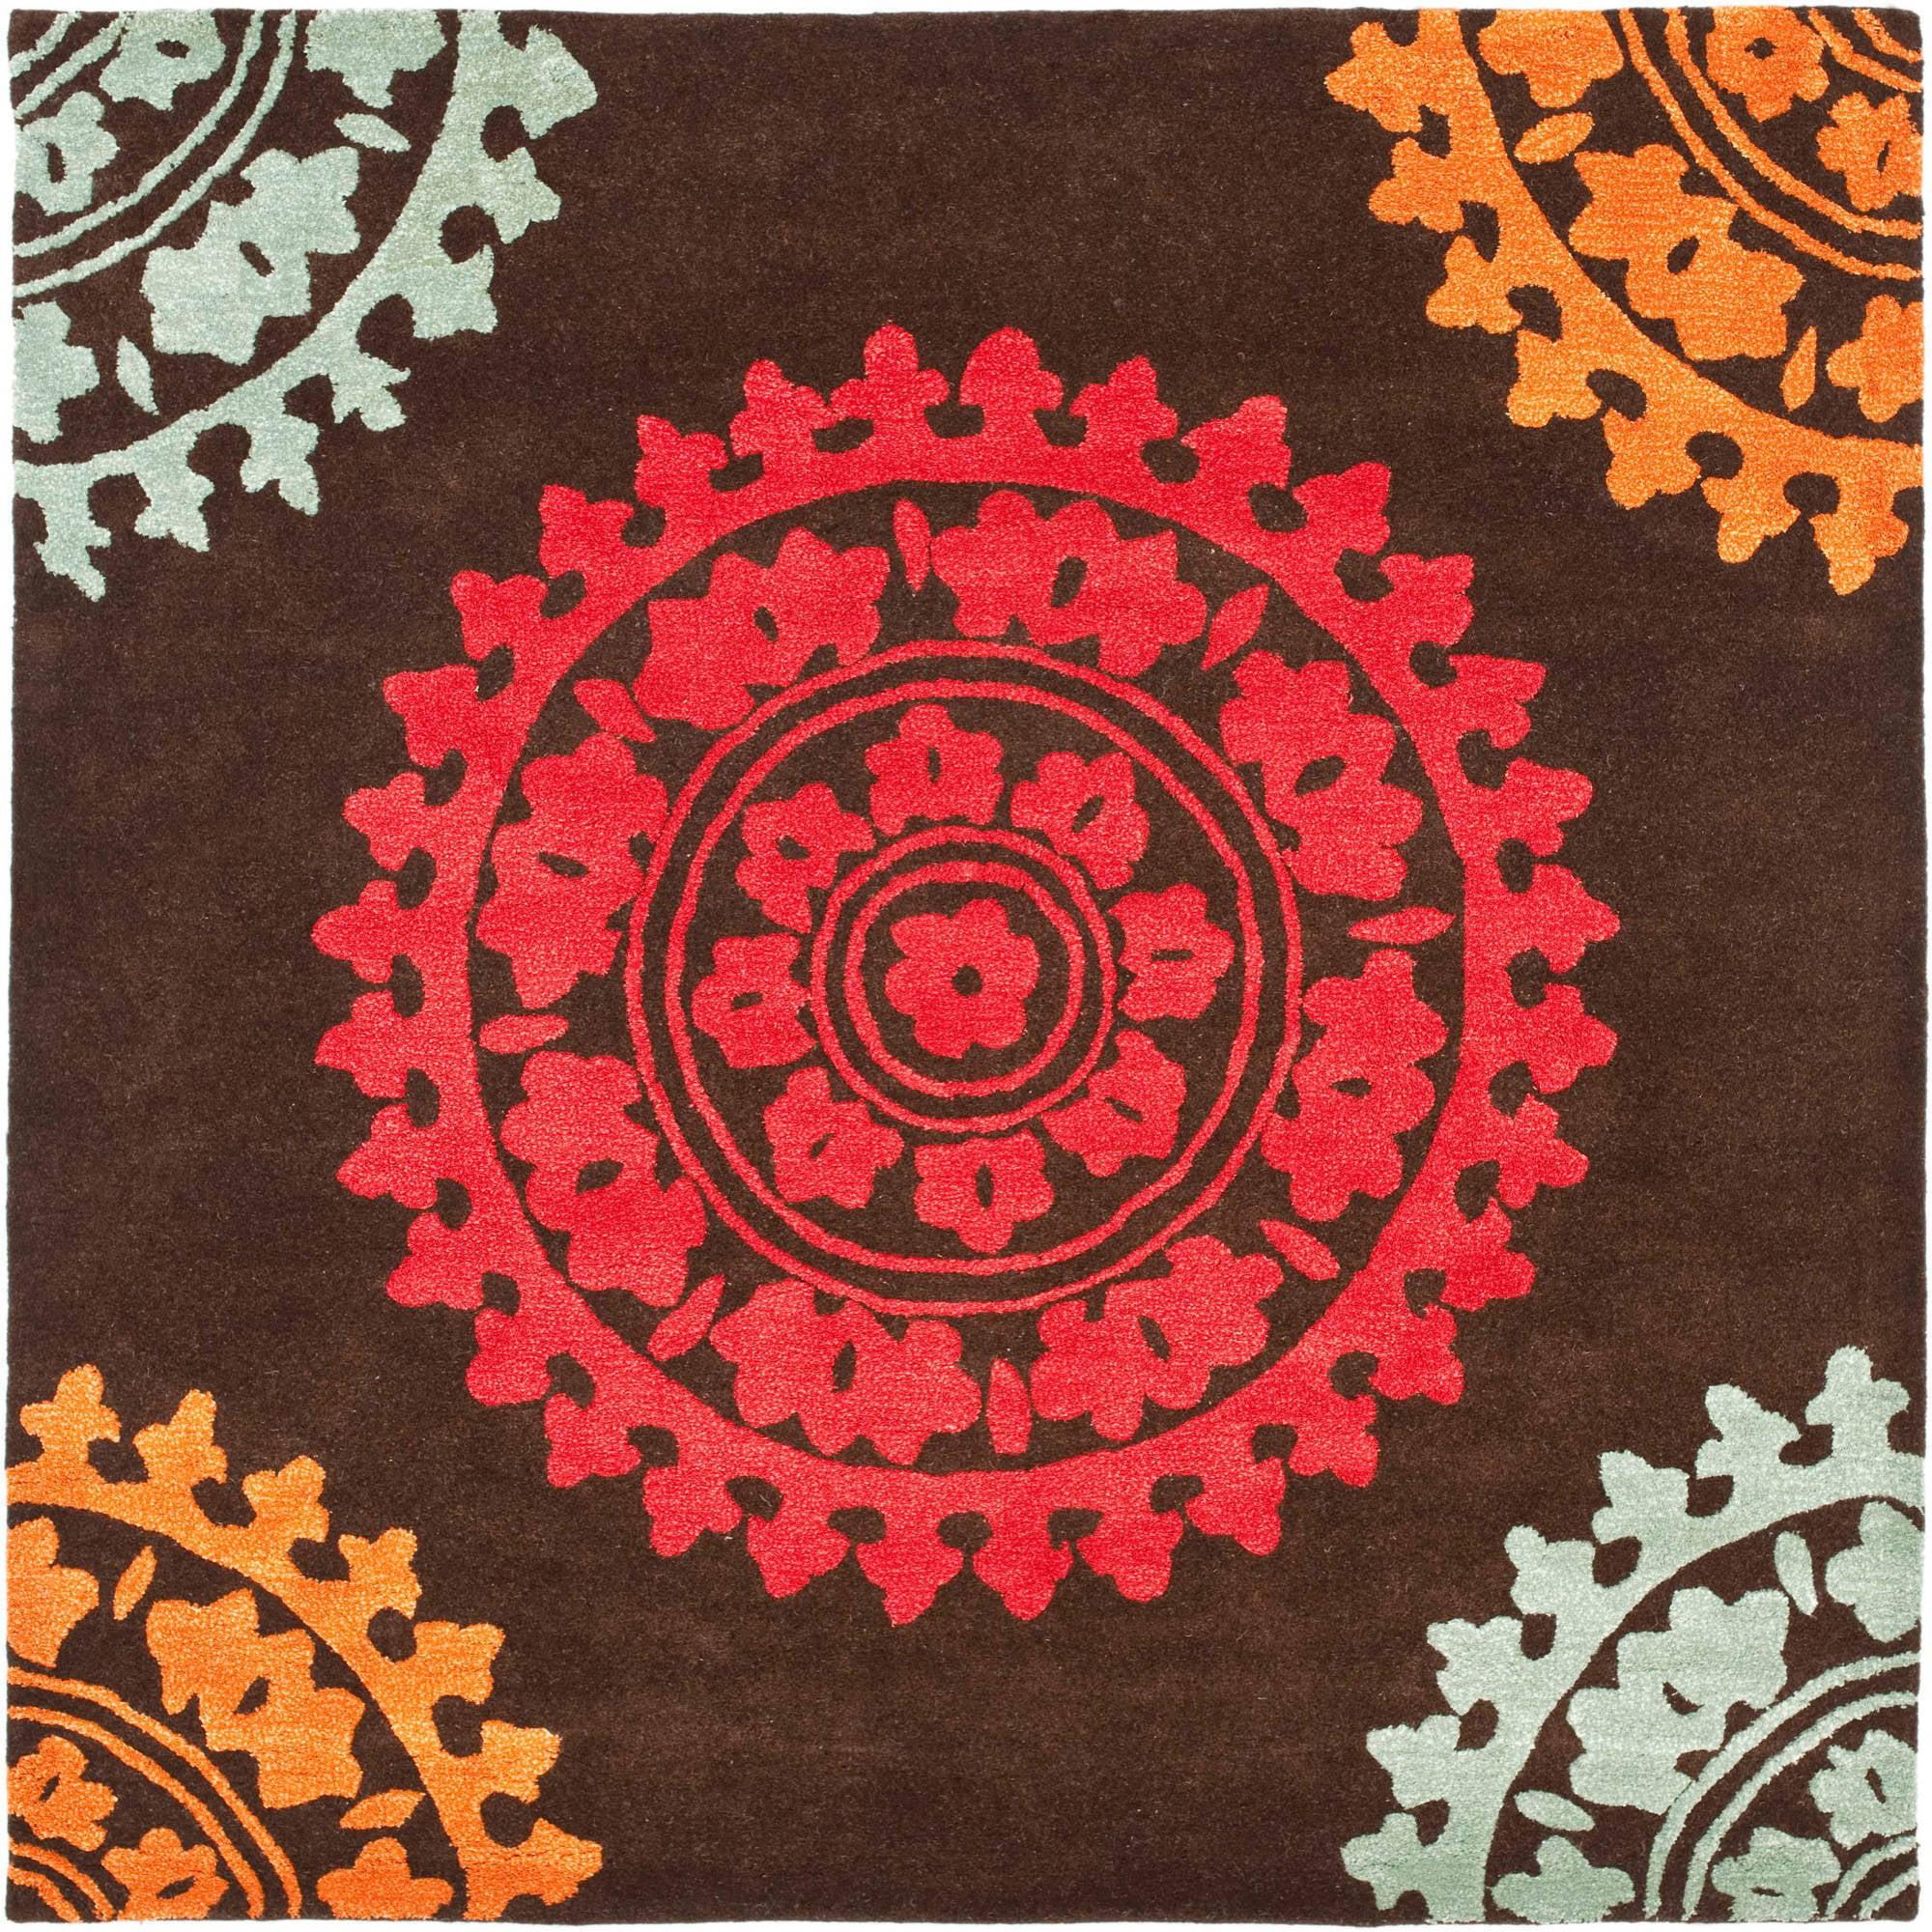 Safavieh Soho Aubrey Wool Square Rug, Brown/Multi-Color, 6' x 6'